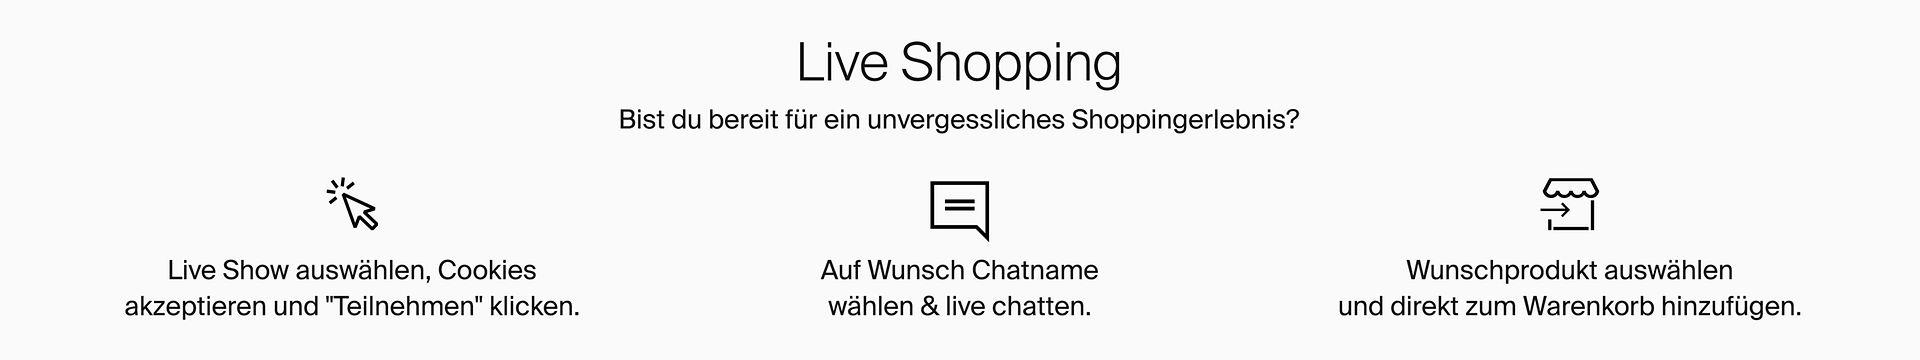 0819_Live_Shopping_LP_POV